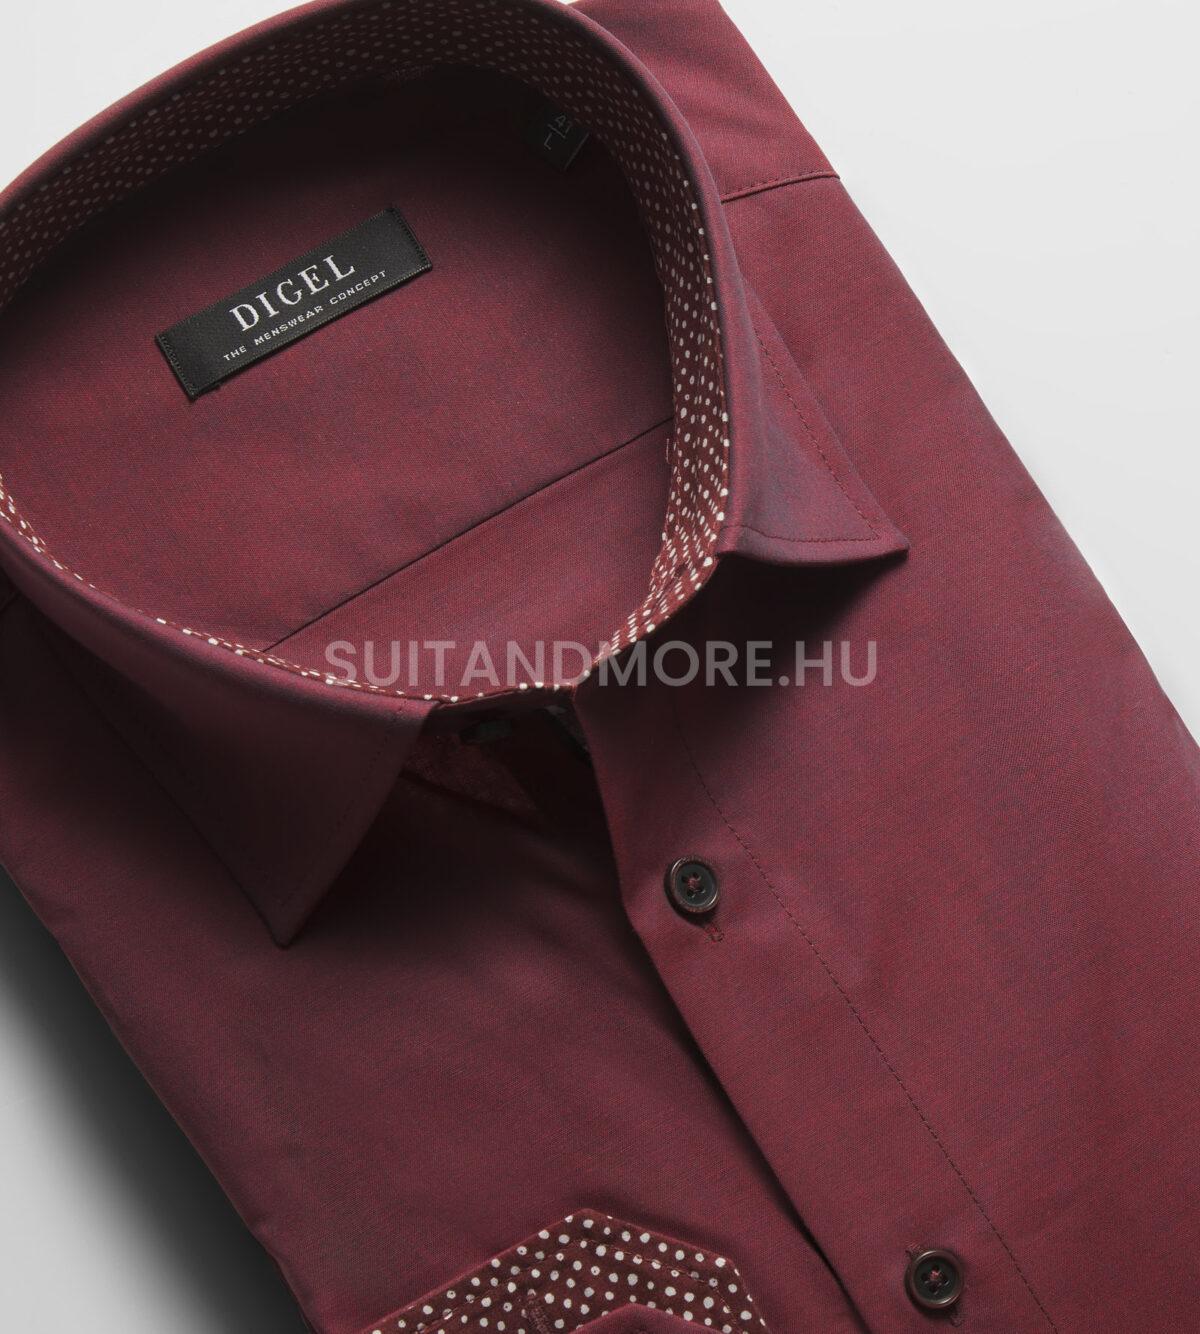 digel-bordo-modern-fit-vasalasmentes-ing-dabato-b1-1-1267009-67-02